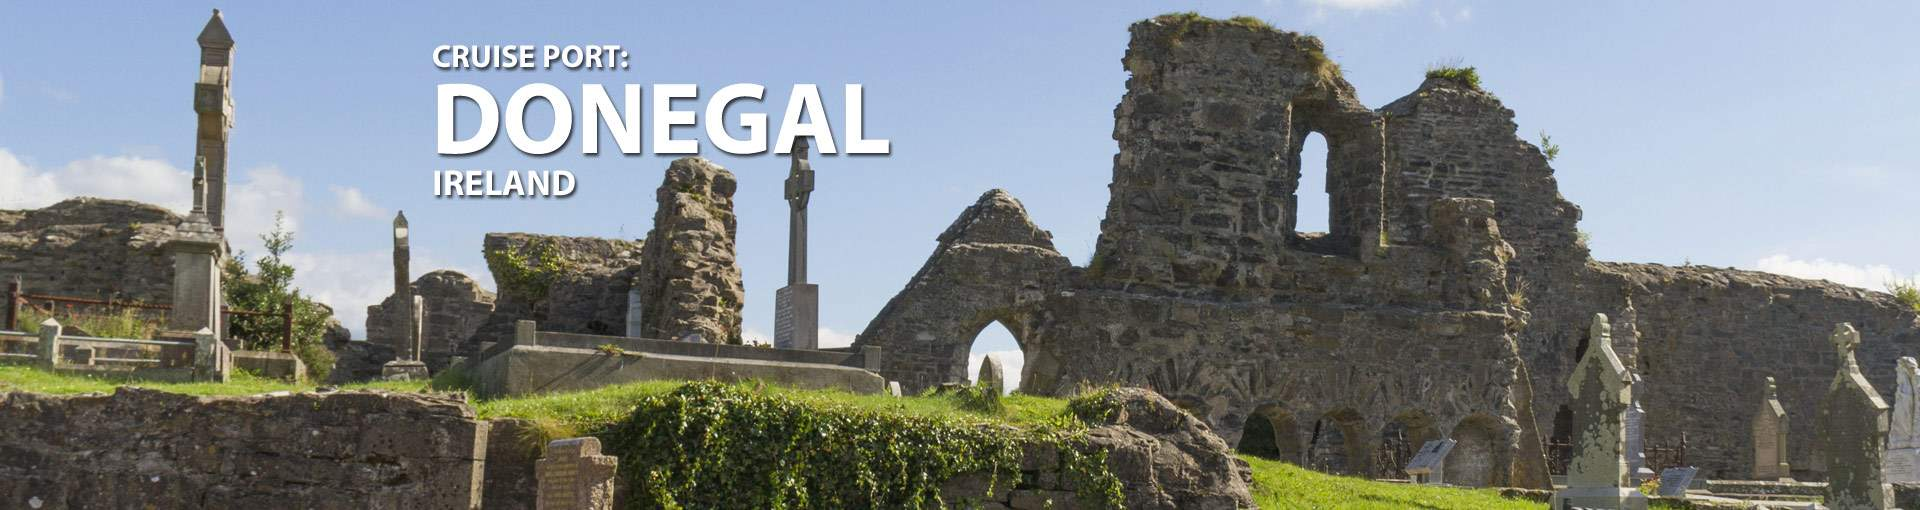 Donegal, Ireland Cruise Port